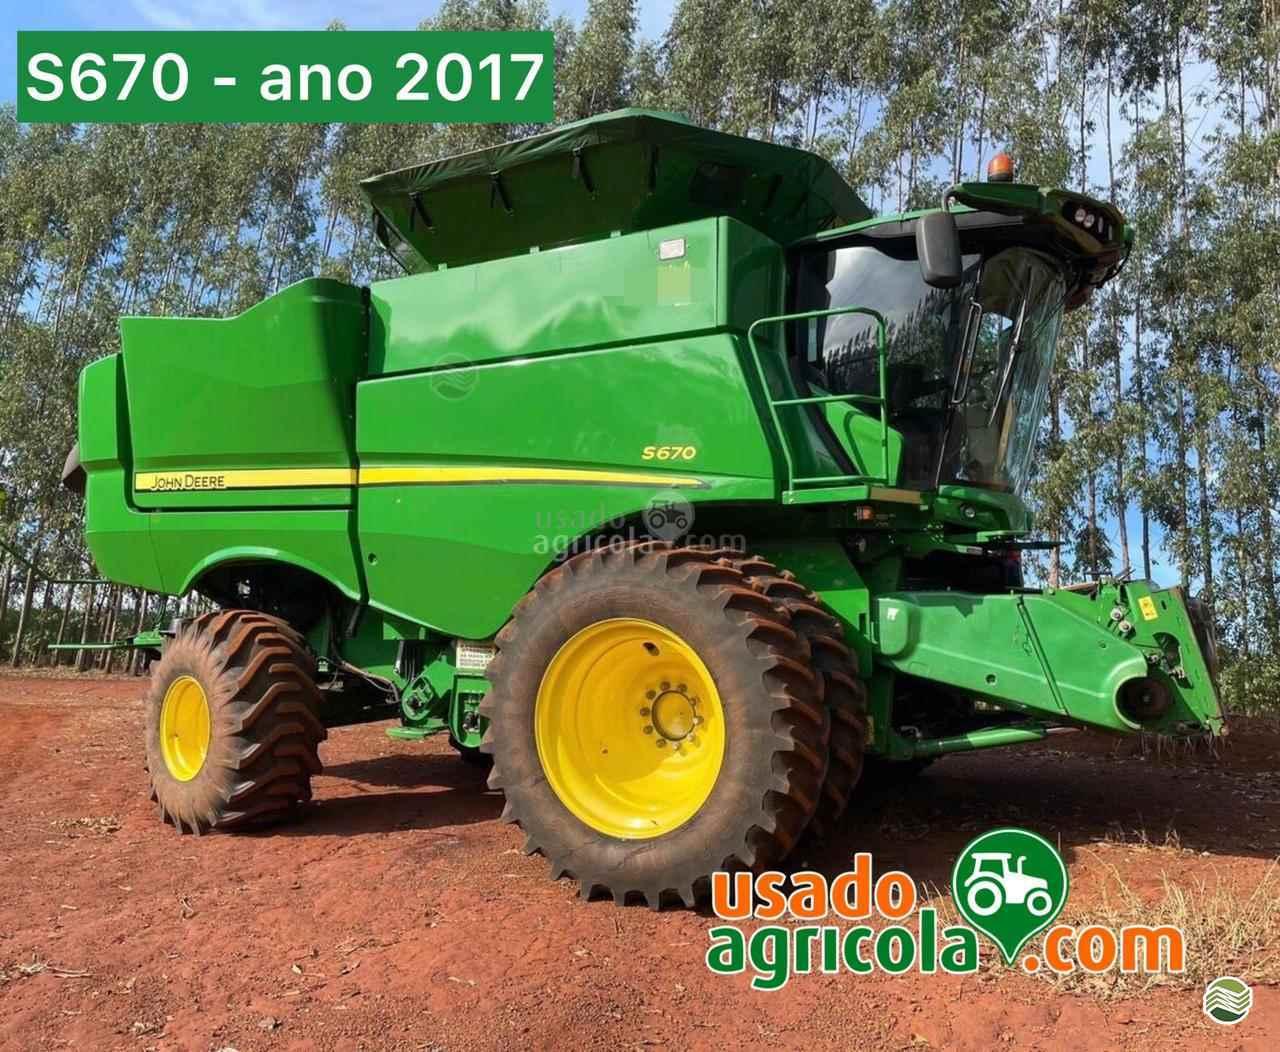 COLHEITADEIRA JOHN DEERE JOHN DEERE S670 Usado Agricola LUCAS DO RIO VERDE MATO GROSSO MT